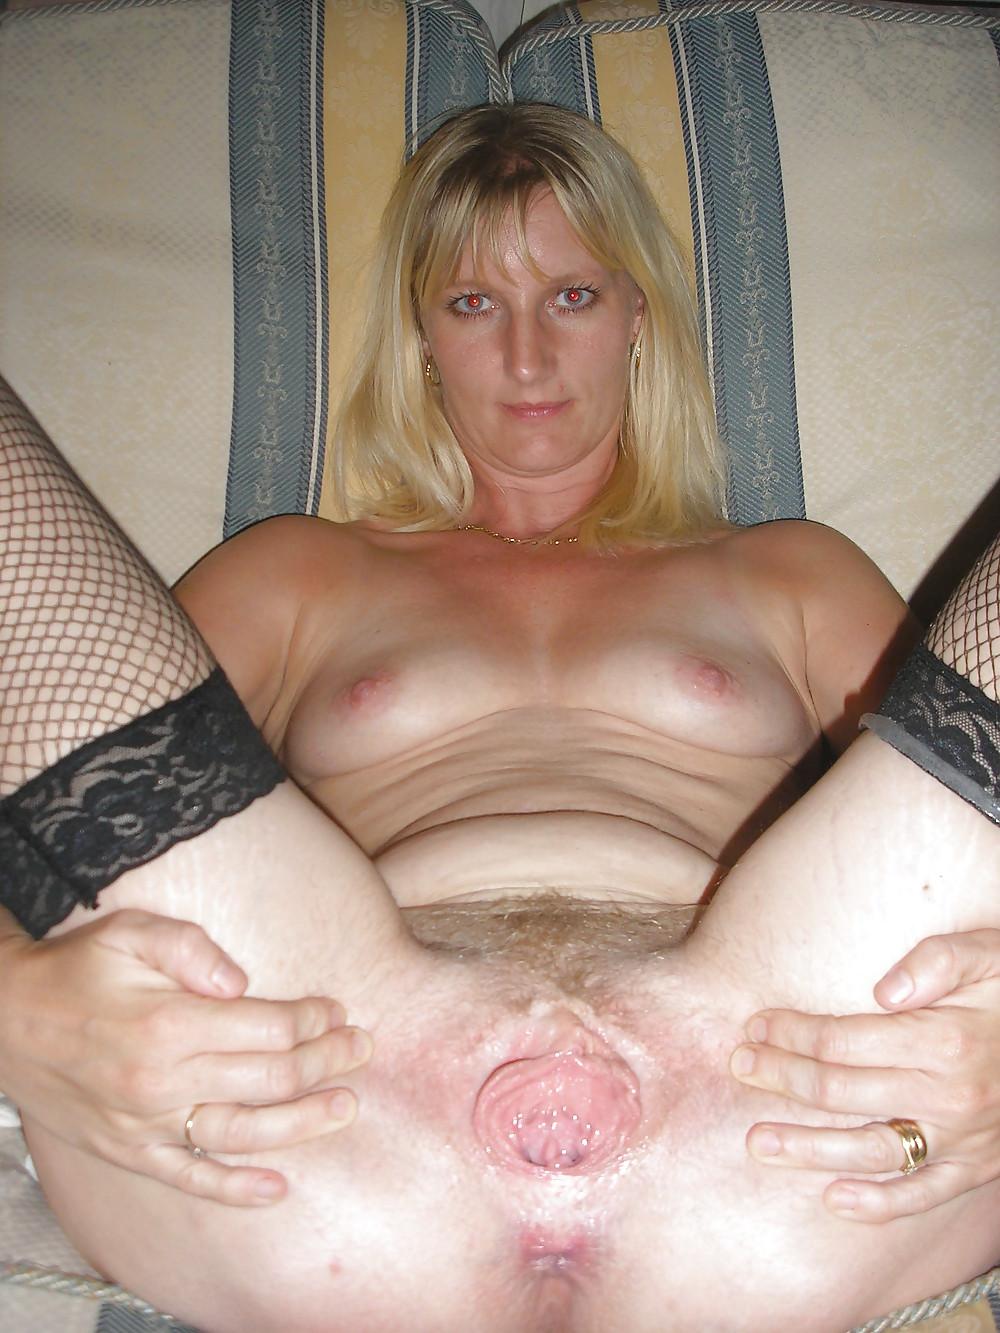 Amateur mature women spread pussy